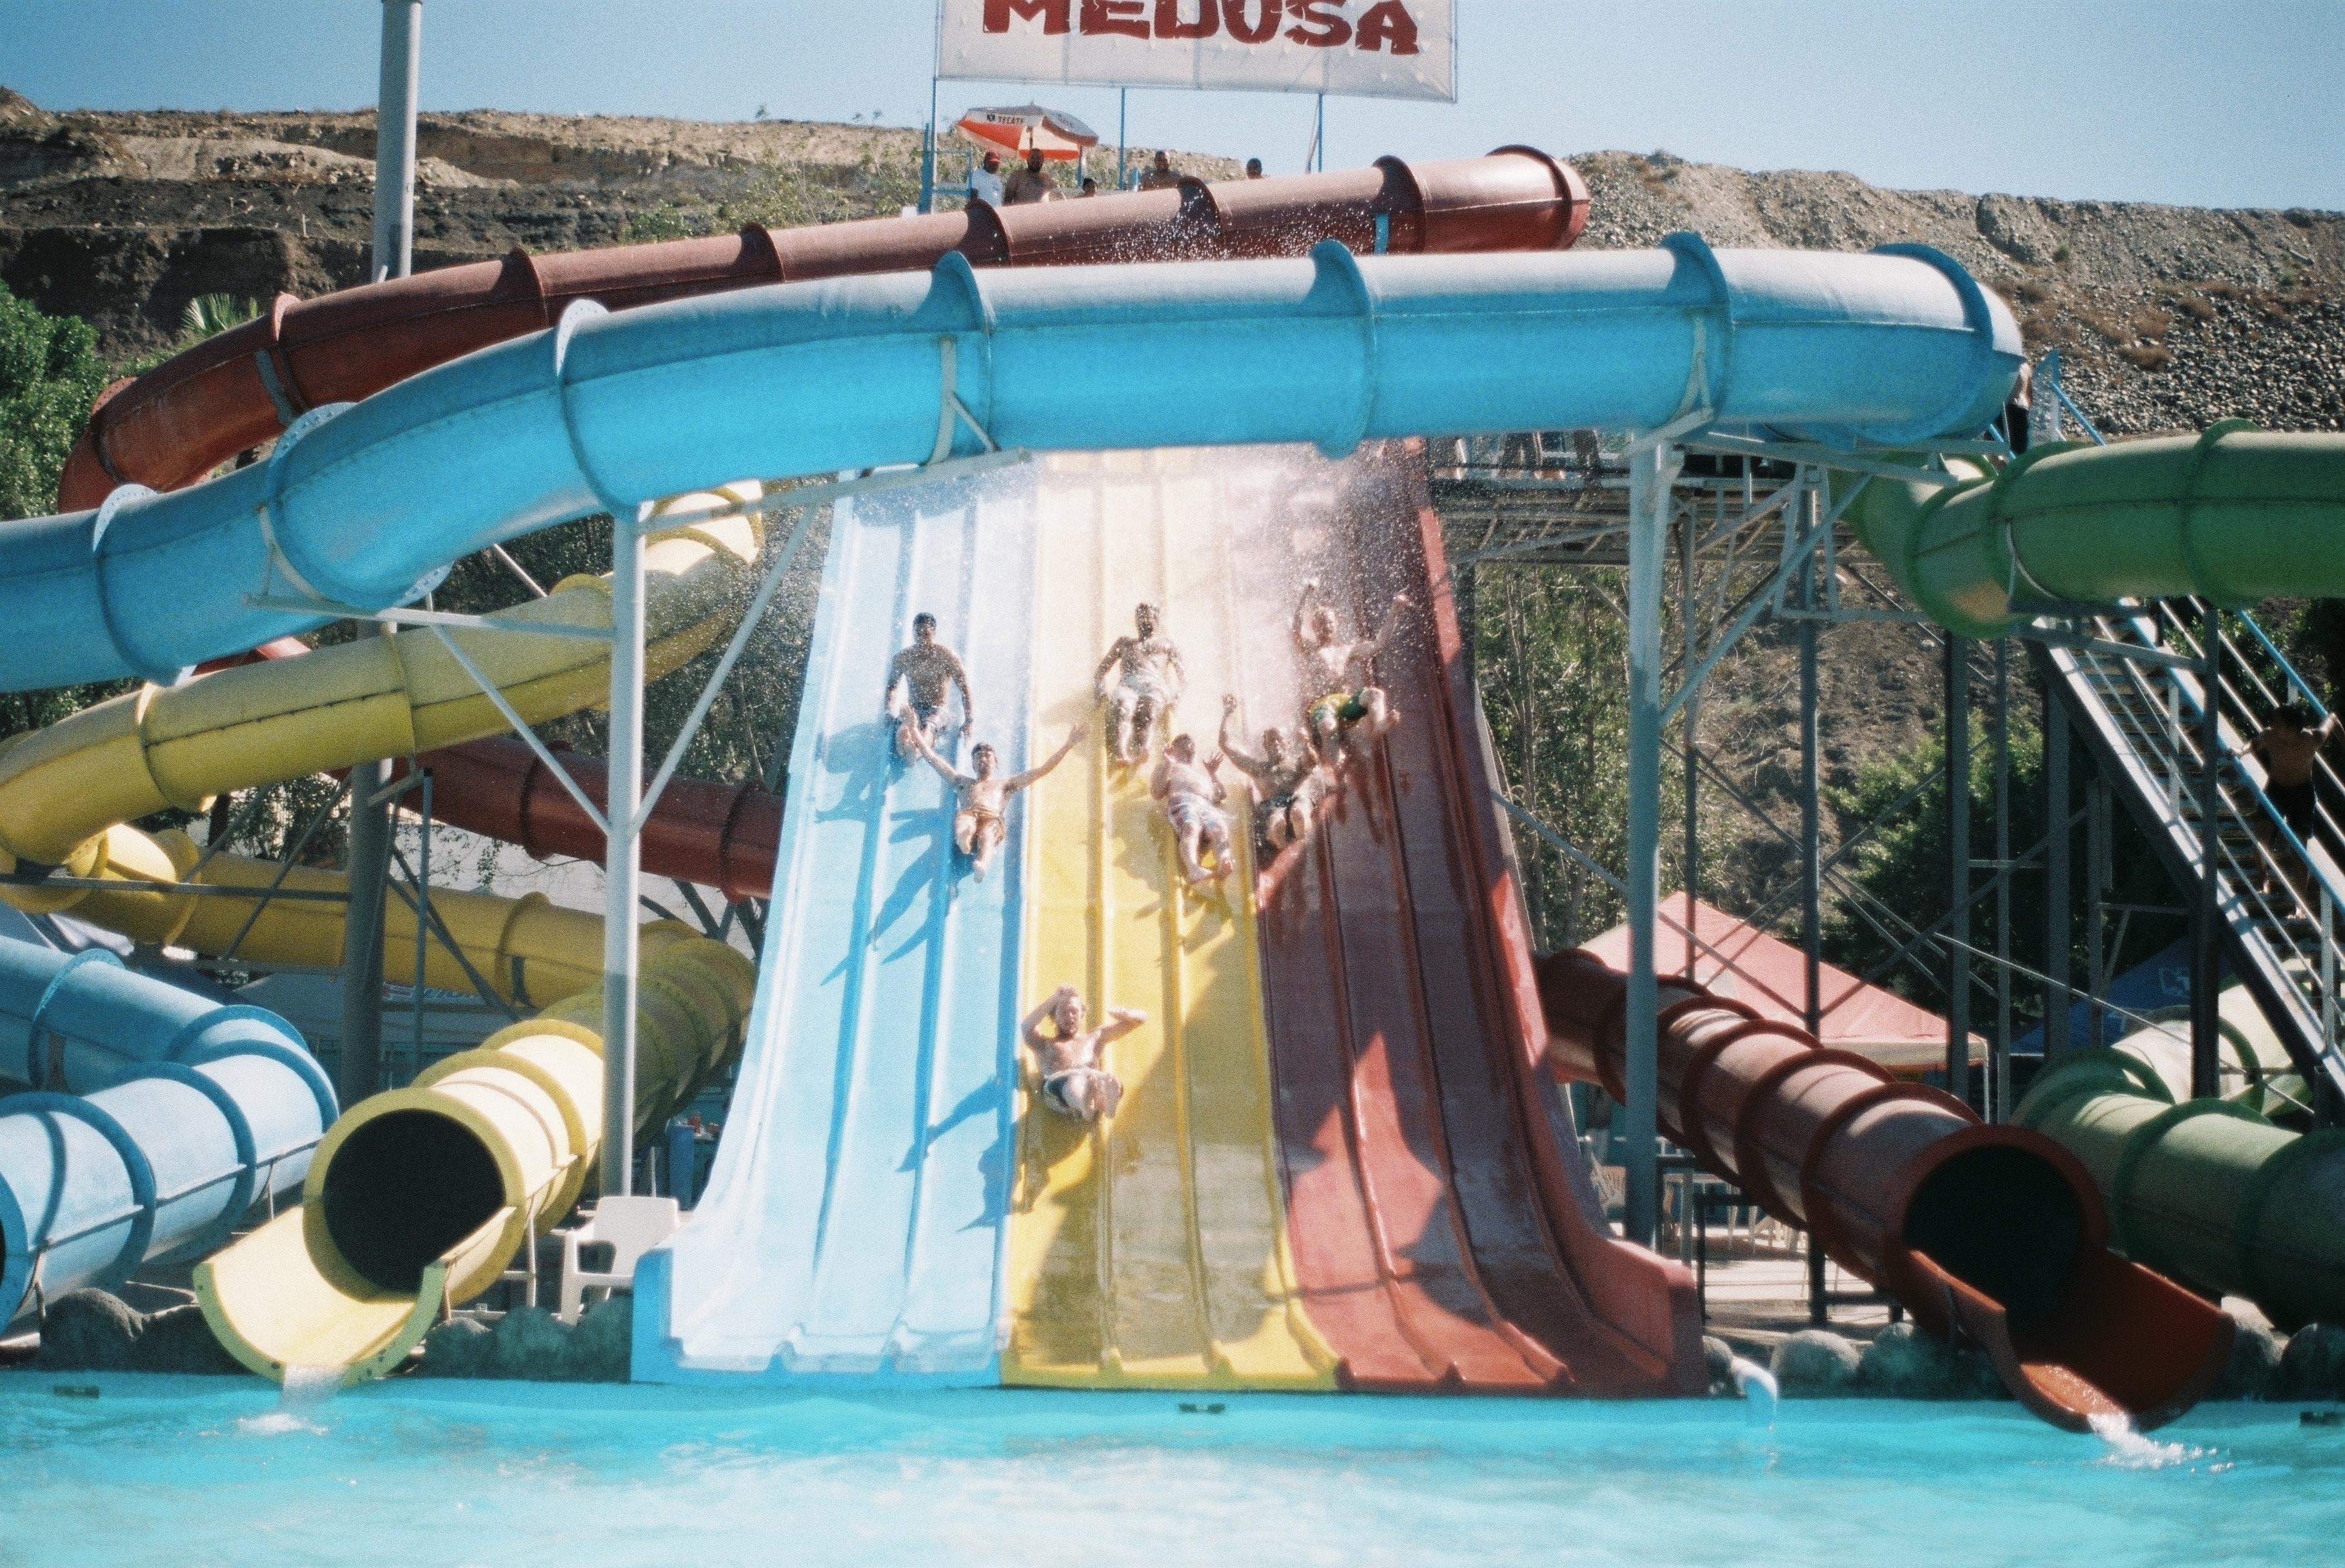 fun plex waterpark and rides omaha nebraska